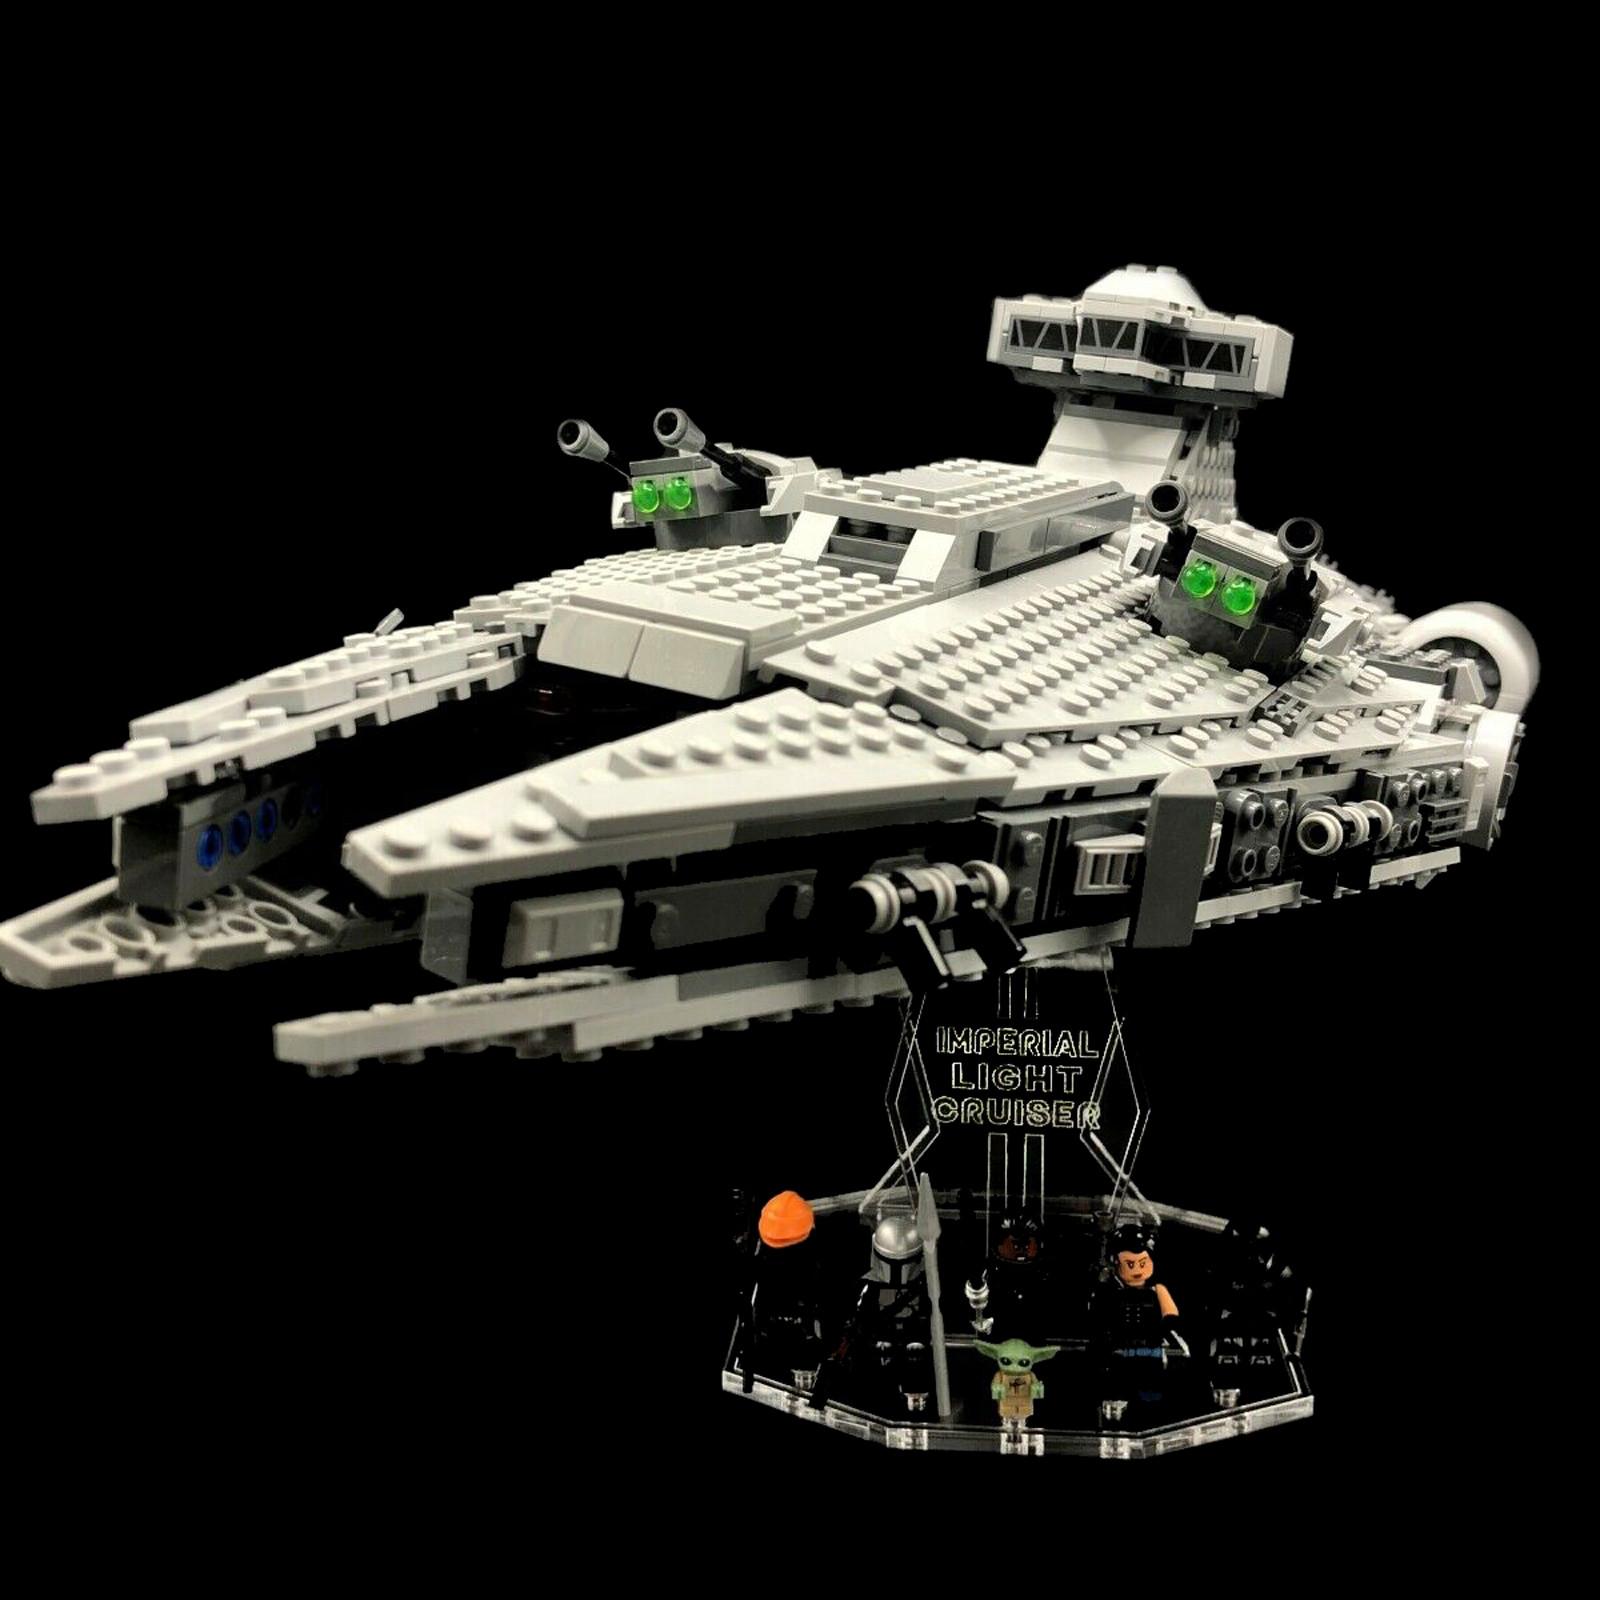 Acryl Deko Präsentation Standfuss LEGO Modell 75315 Imperial Light Cruiser